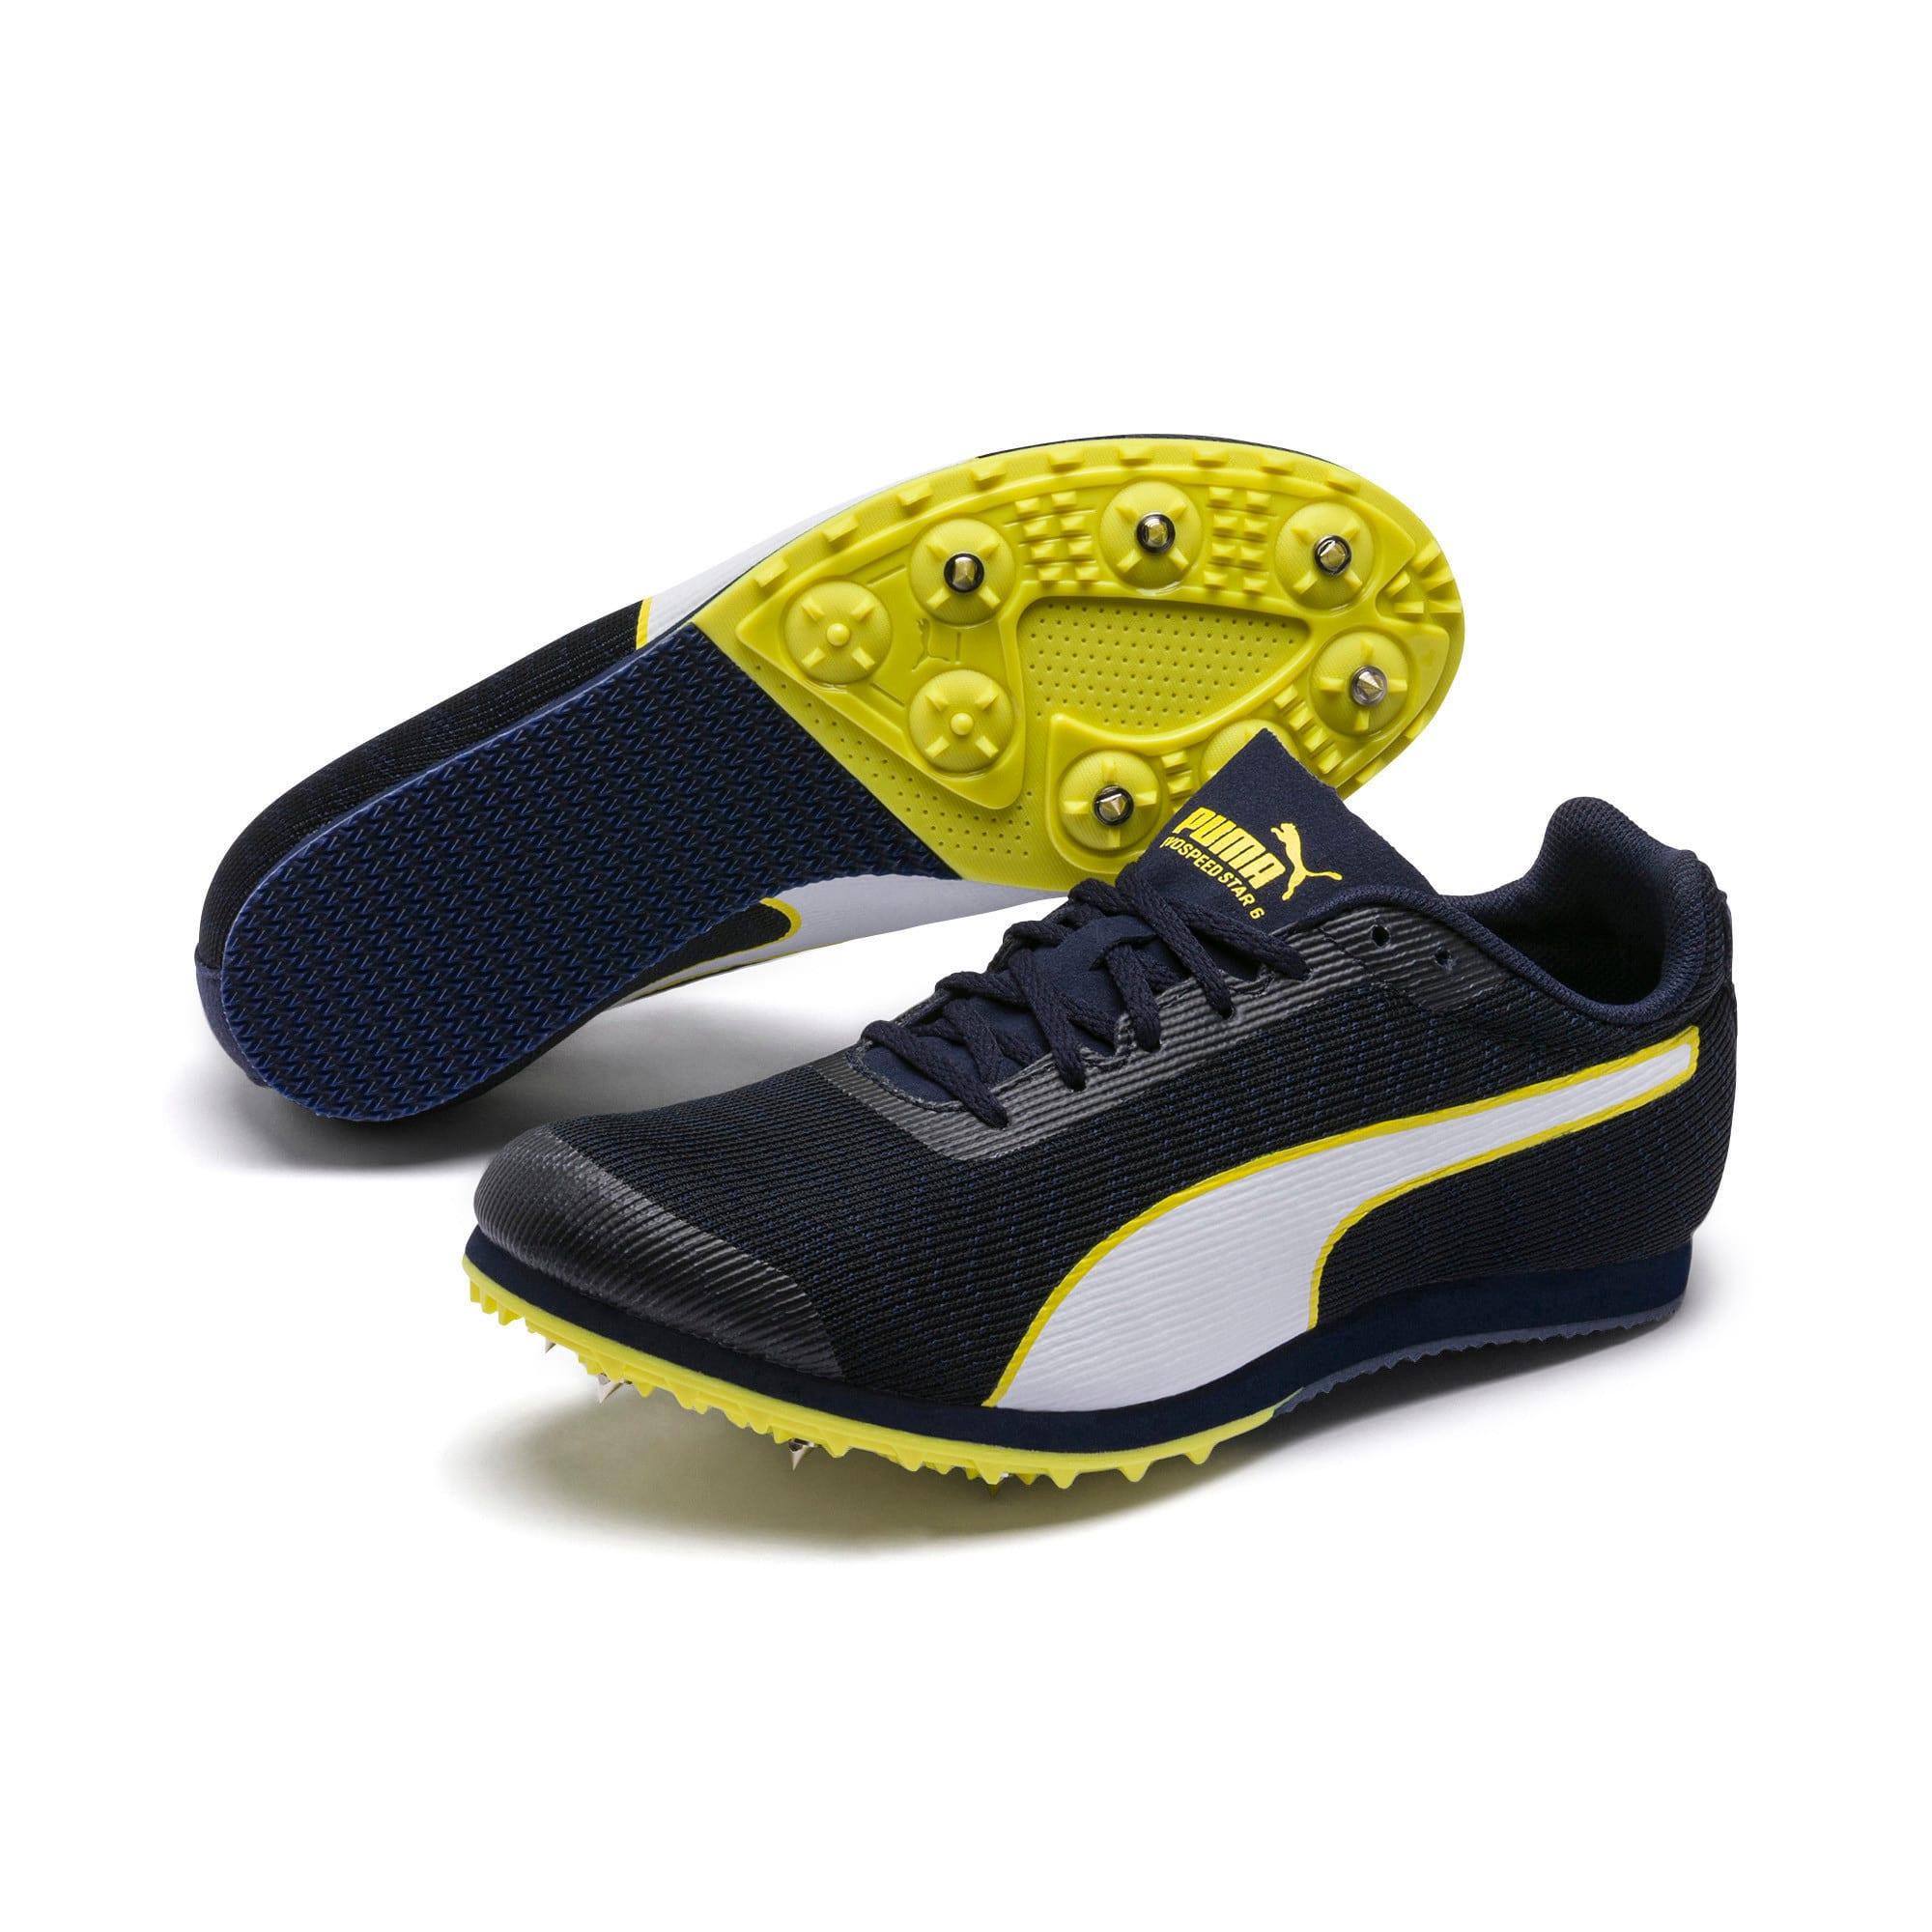 Thumbnail 2 of evoSPEED Star 6 Kids' Running Shoes, Peacoat-Puma Black-Yellow, medium-IND